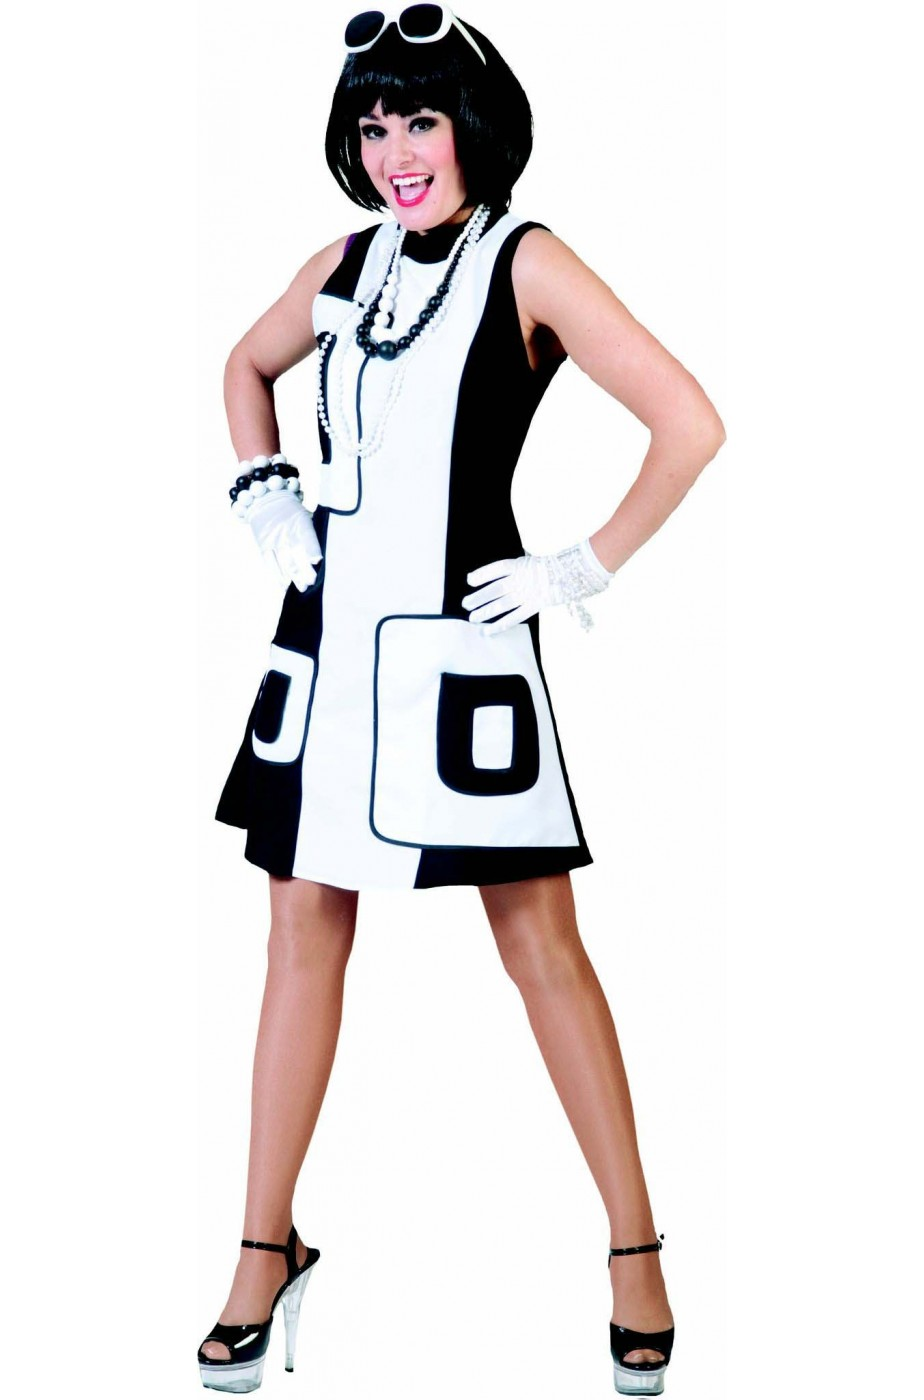 Costume 50 Anni Sexy Yv6gybf7 60 Taglia Donna Unica v08nmNwO